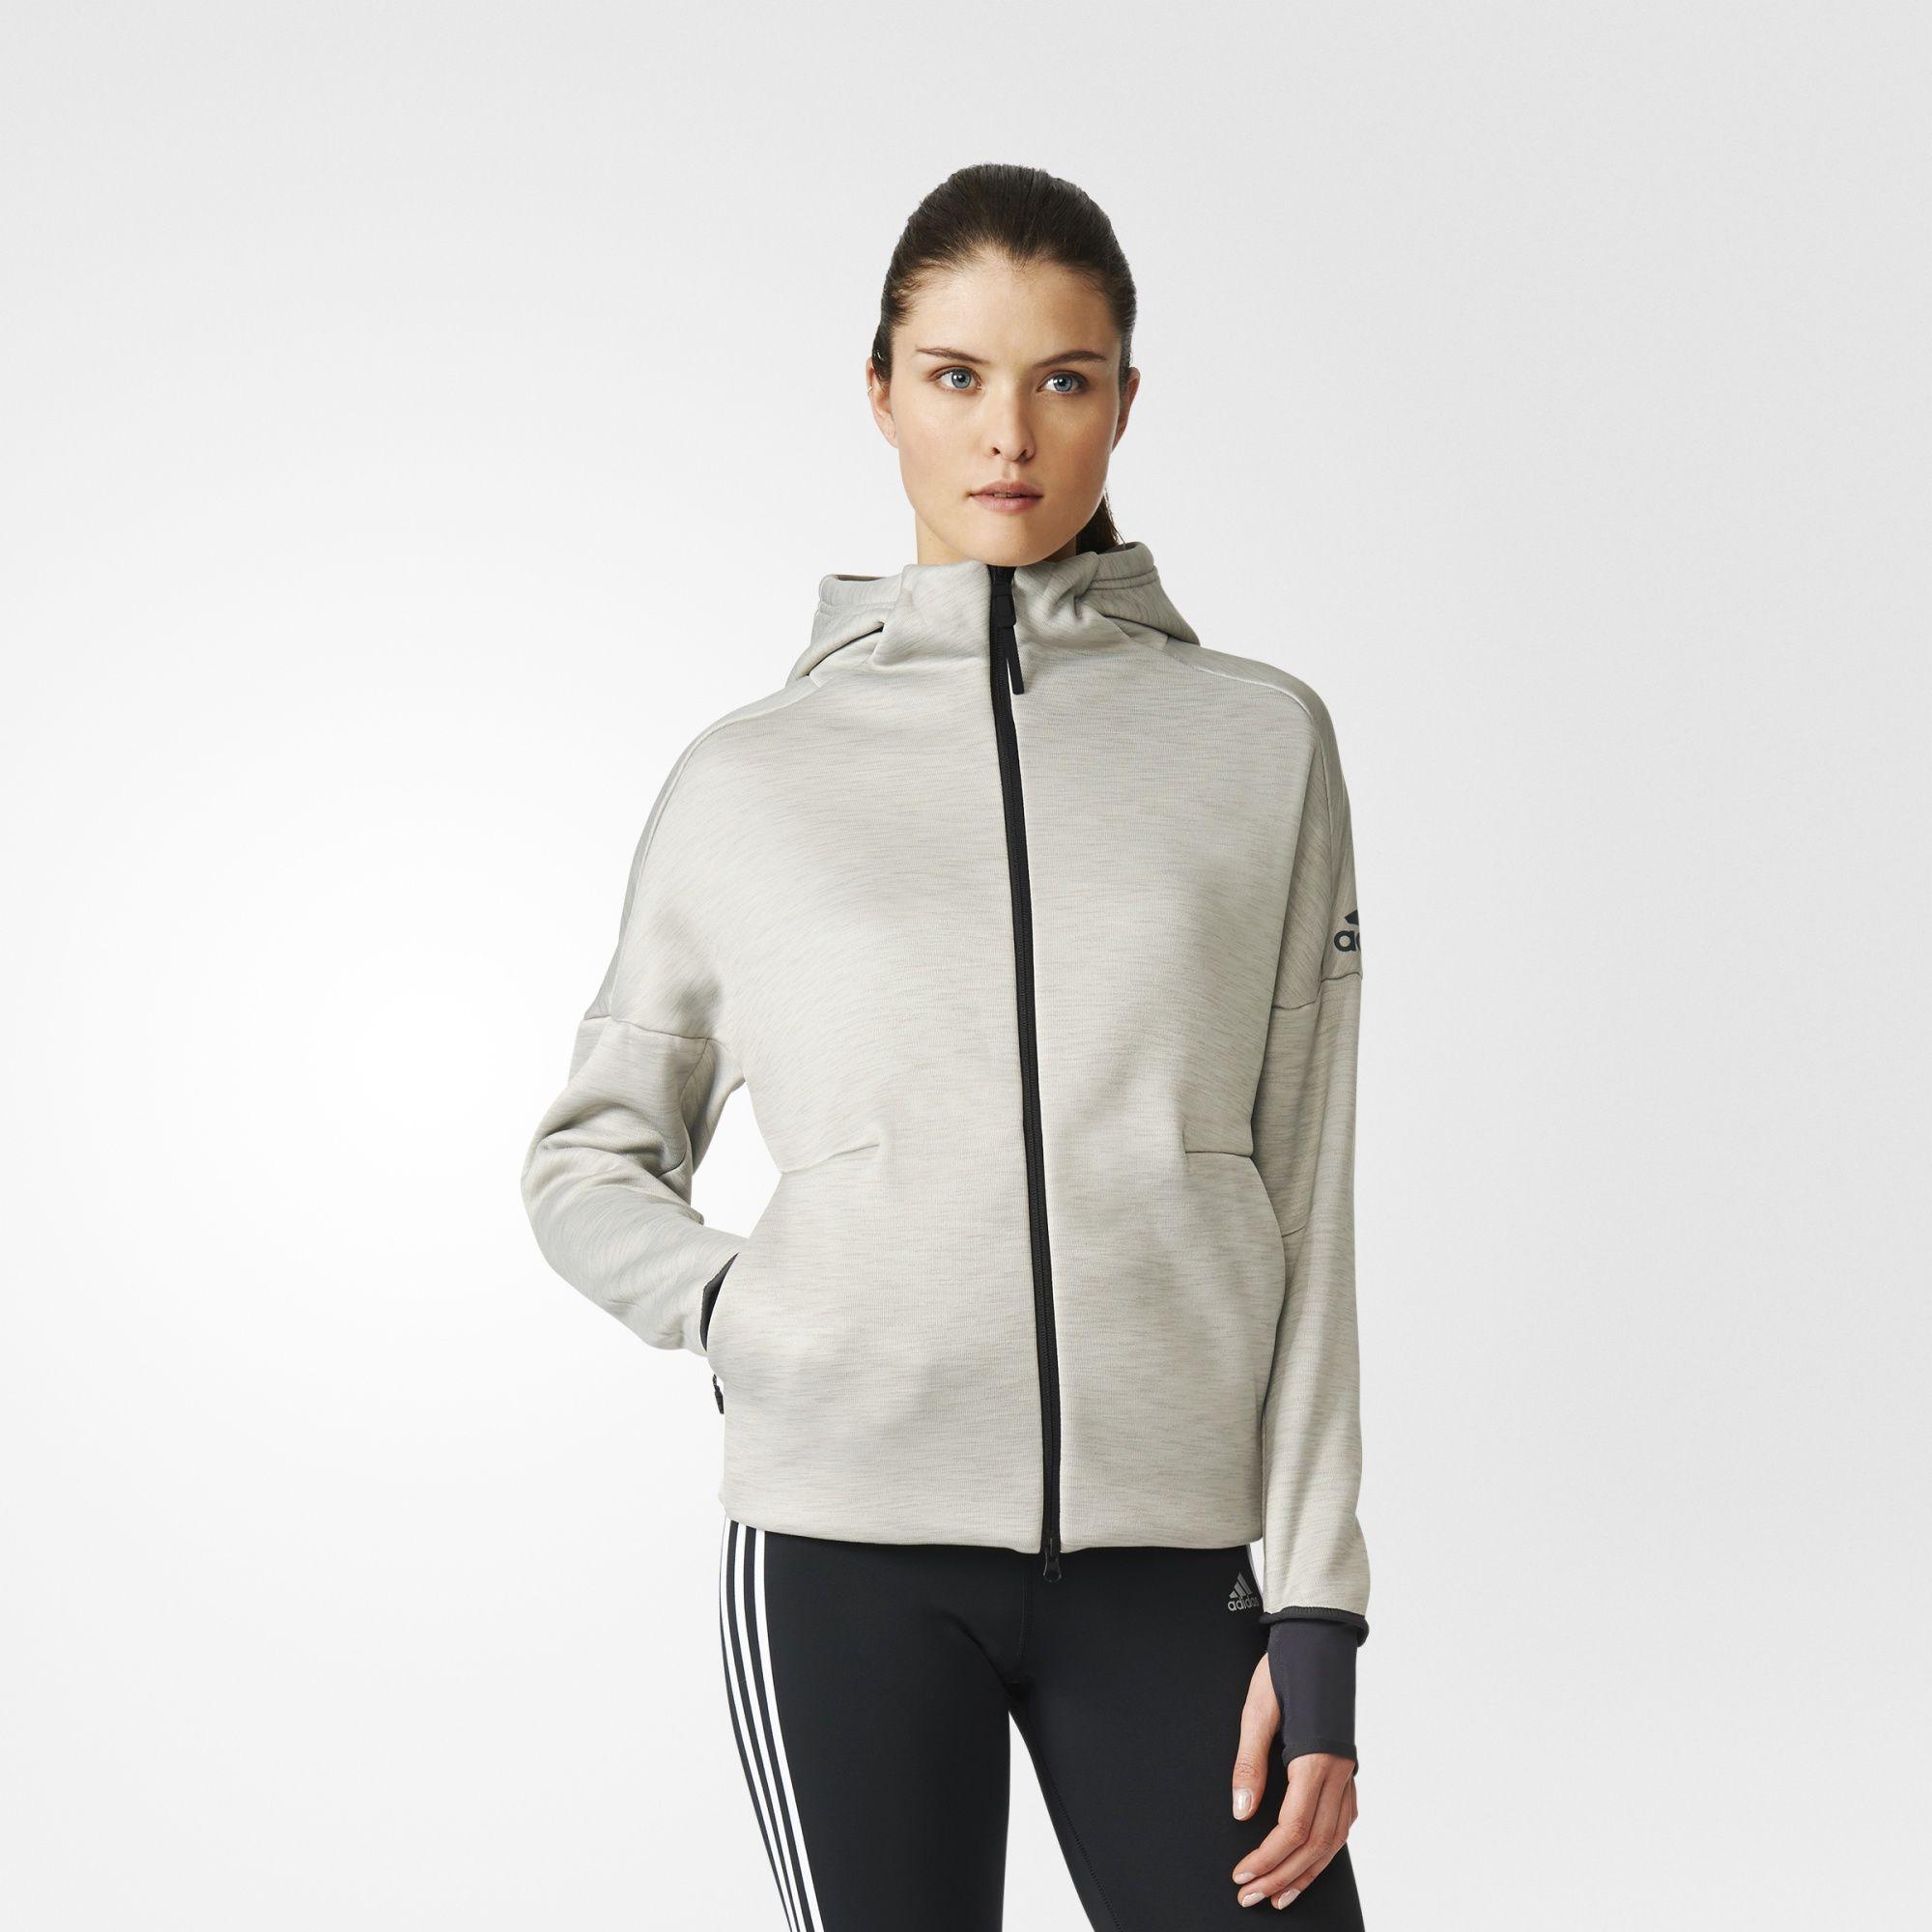 adidas - Z.N.E. Climaheat Hoodie  2e842c42a87